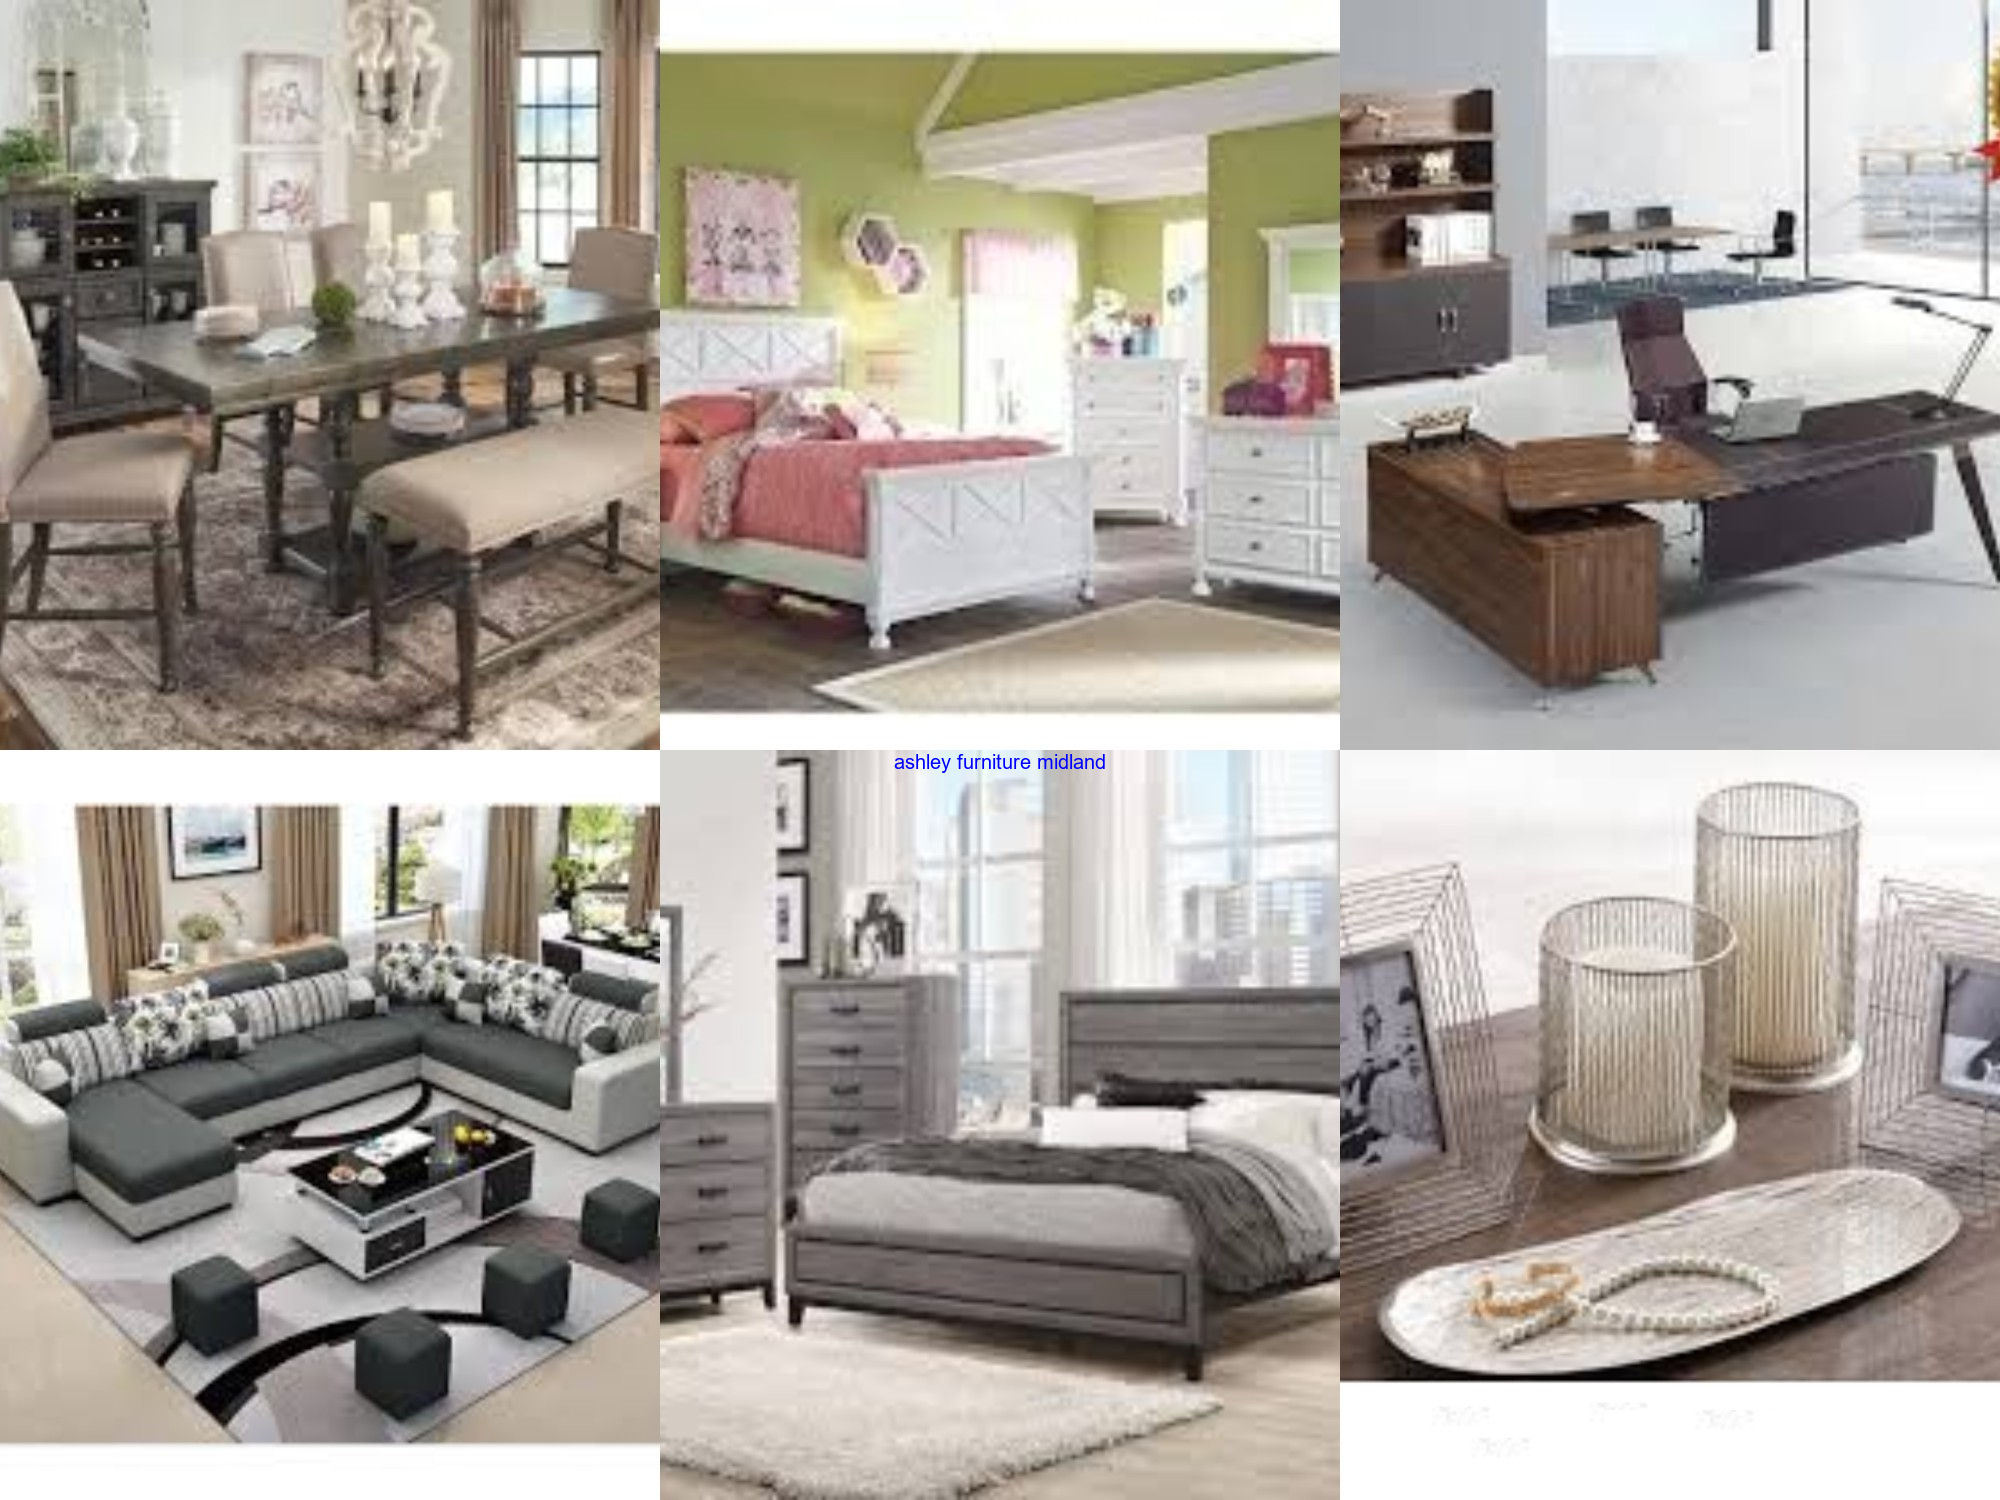 Ashley Furniture Midland Furniture Prices Furniture Reviews Ashley Furniture